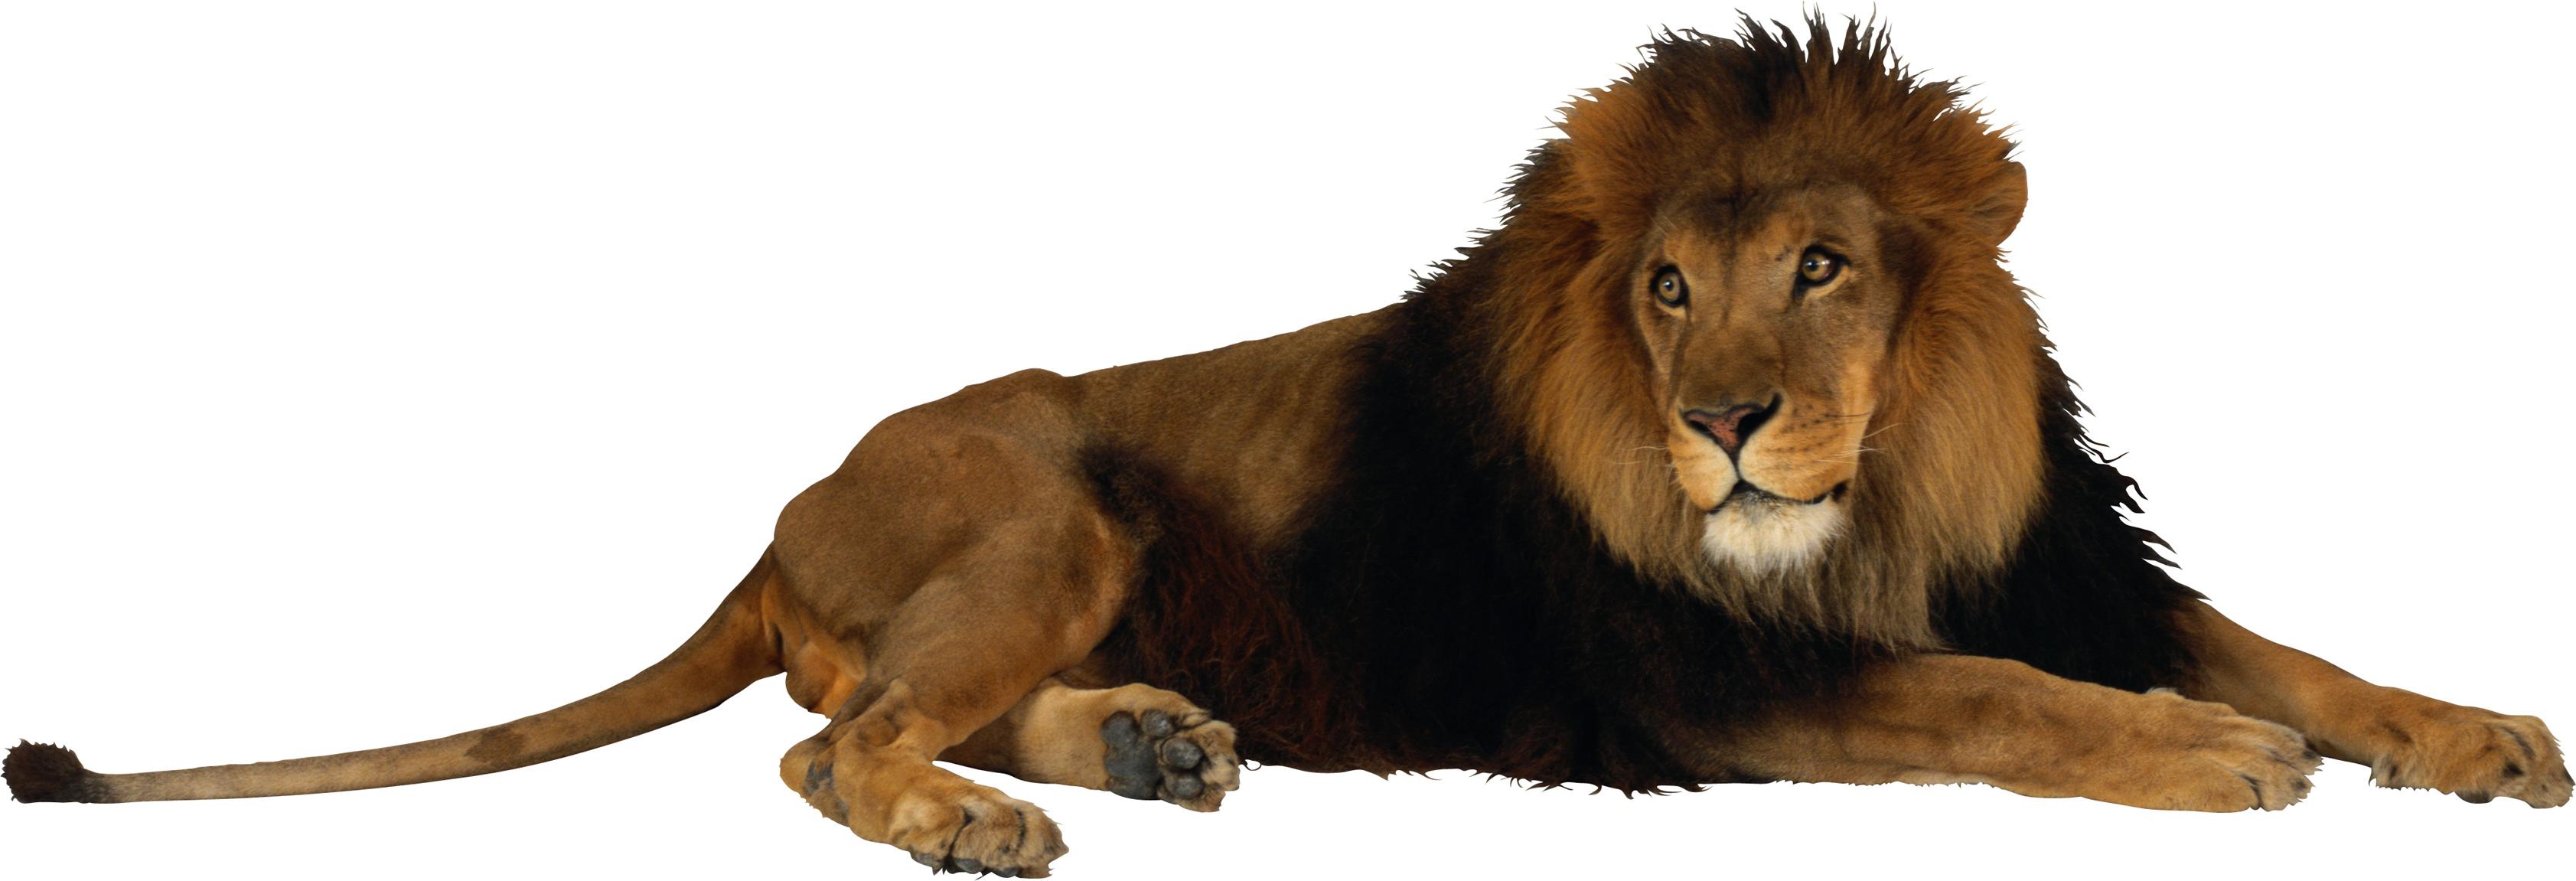 Lion PNG image - Lion And Den PNG